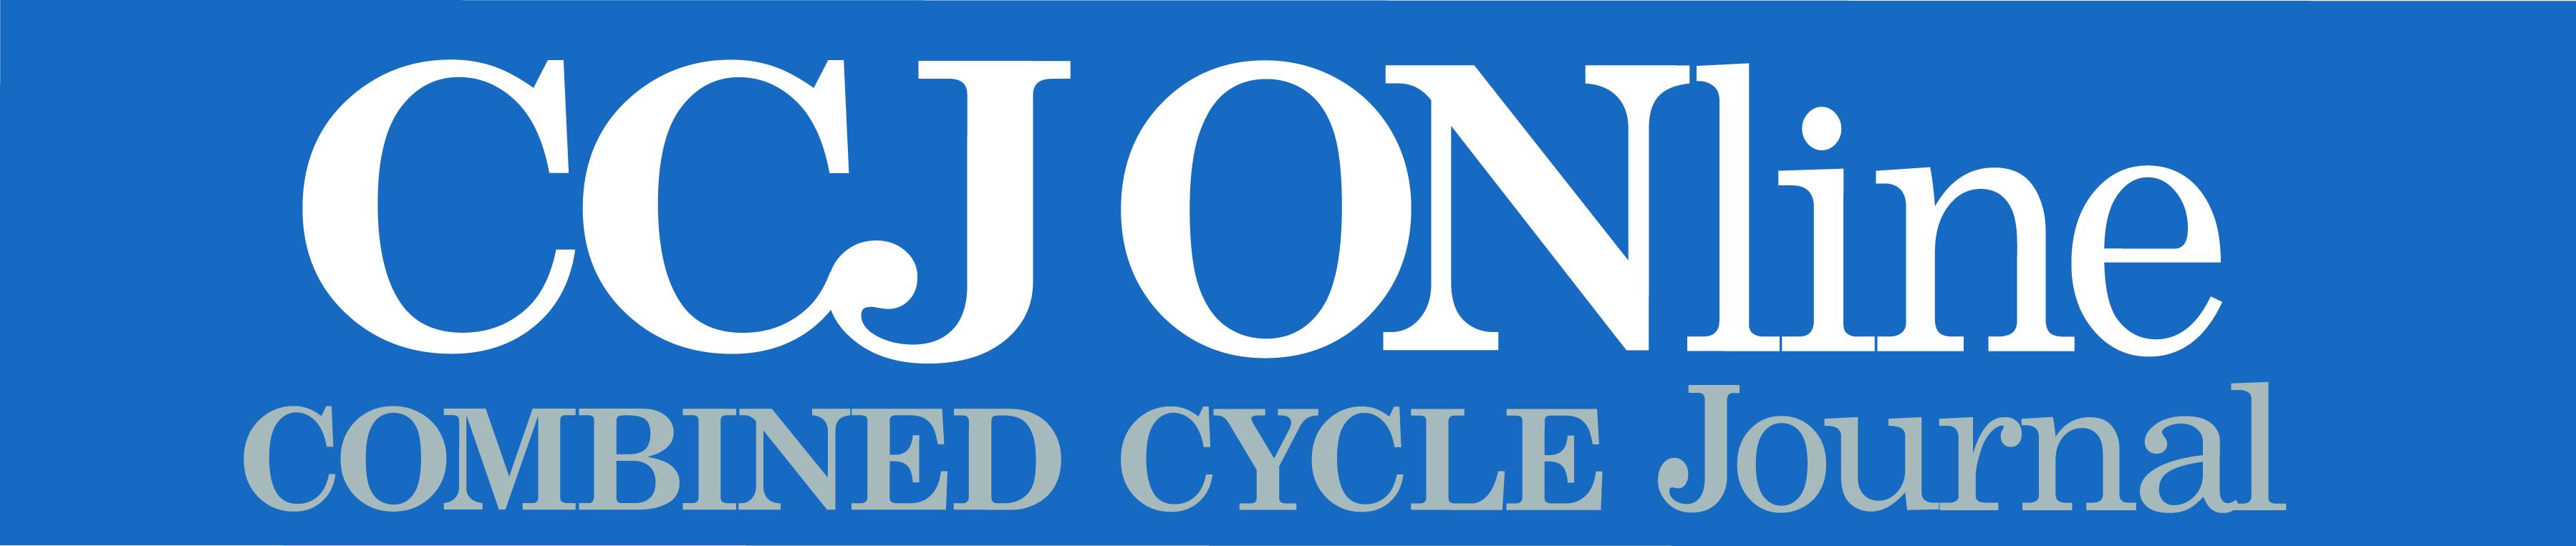 CCJ_ONline_logo